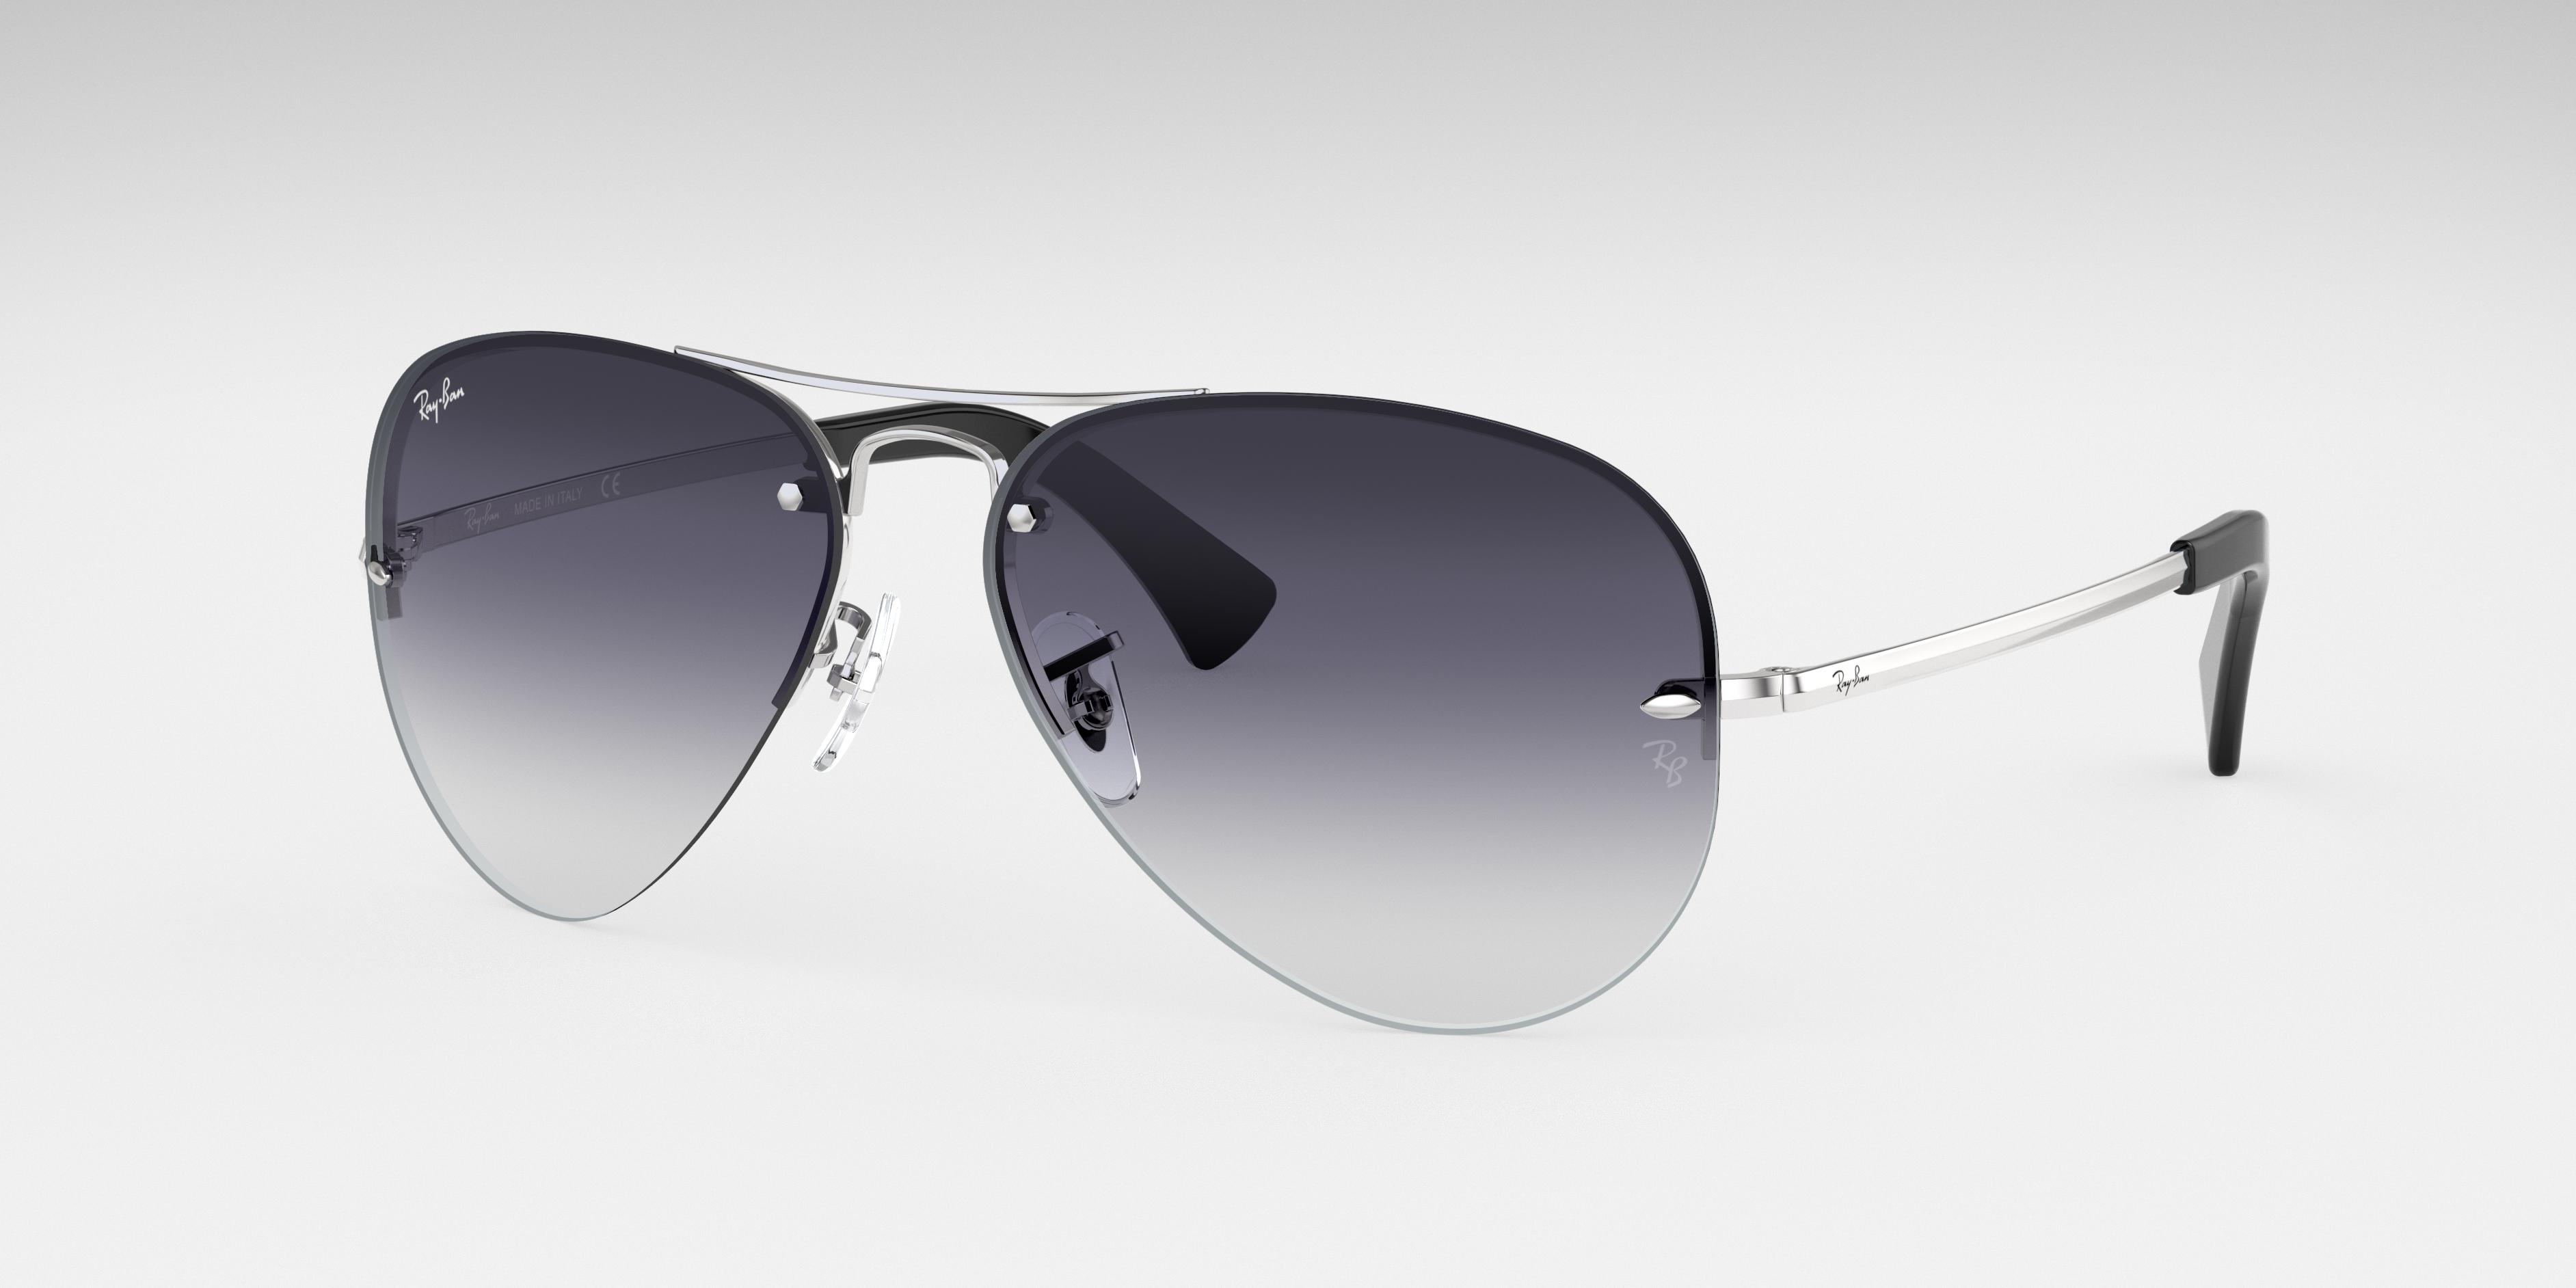 Ray-Ban Rb3449 Silver, Gray Lenses - RB3449